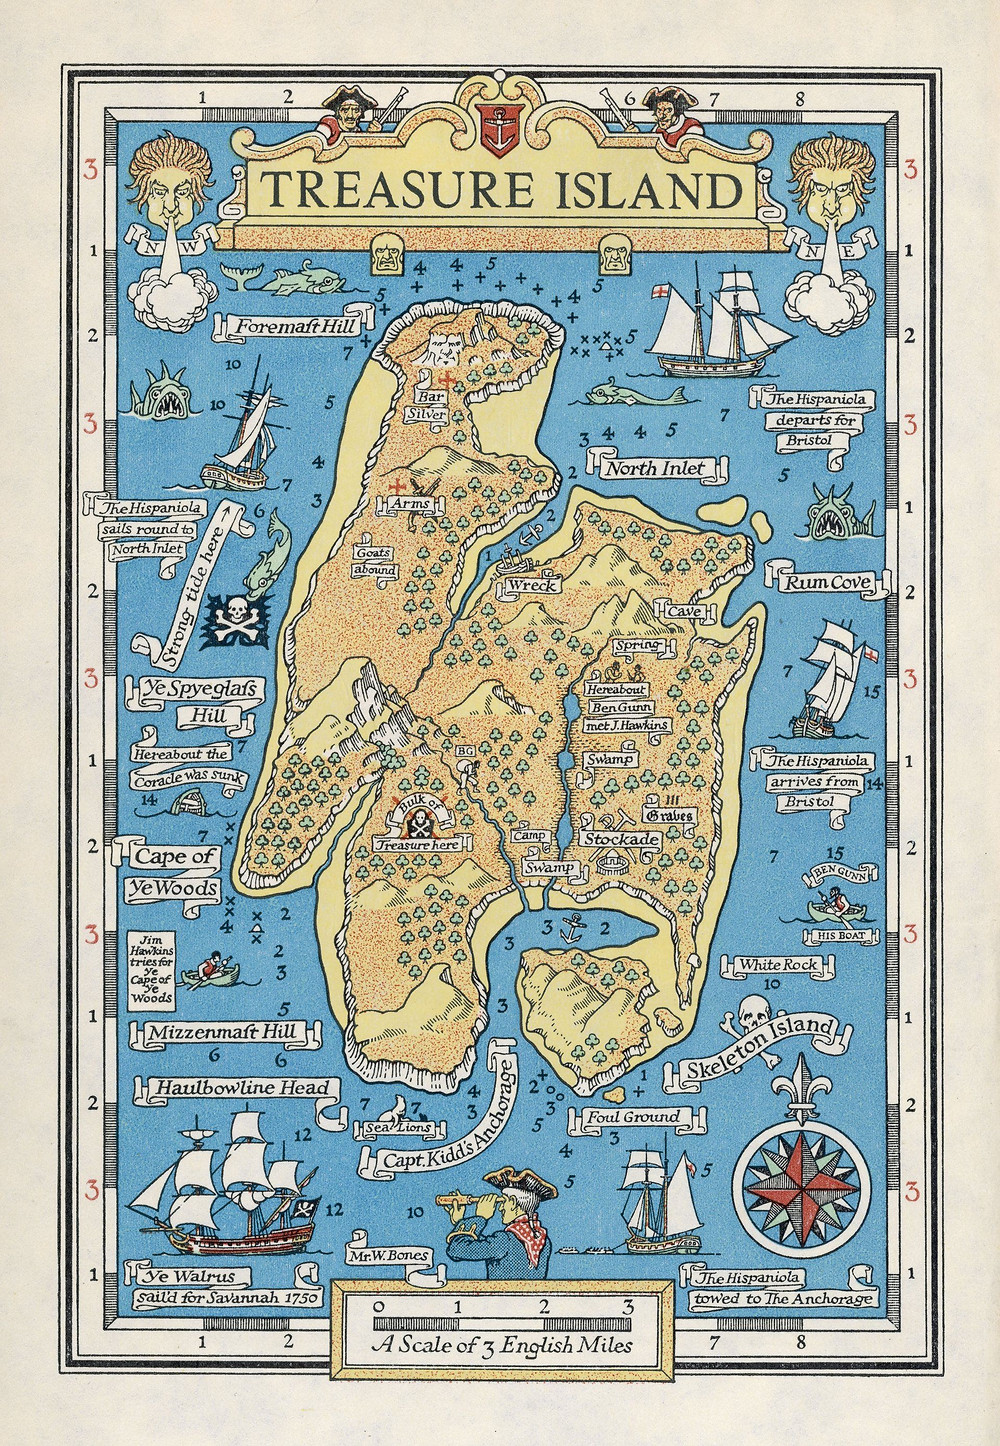 treasure island book map, skeleton island treasure island, skeleton island map